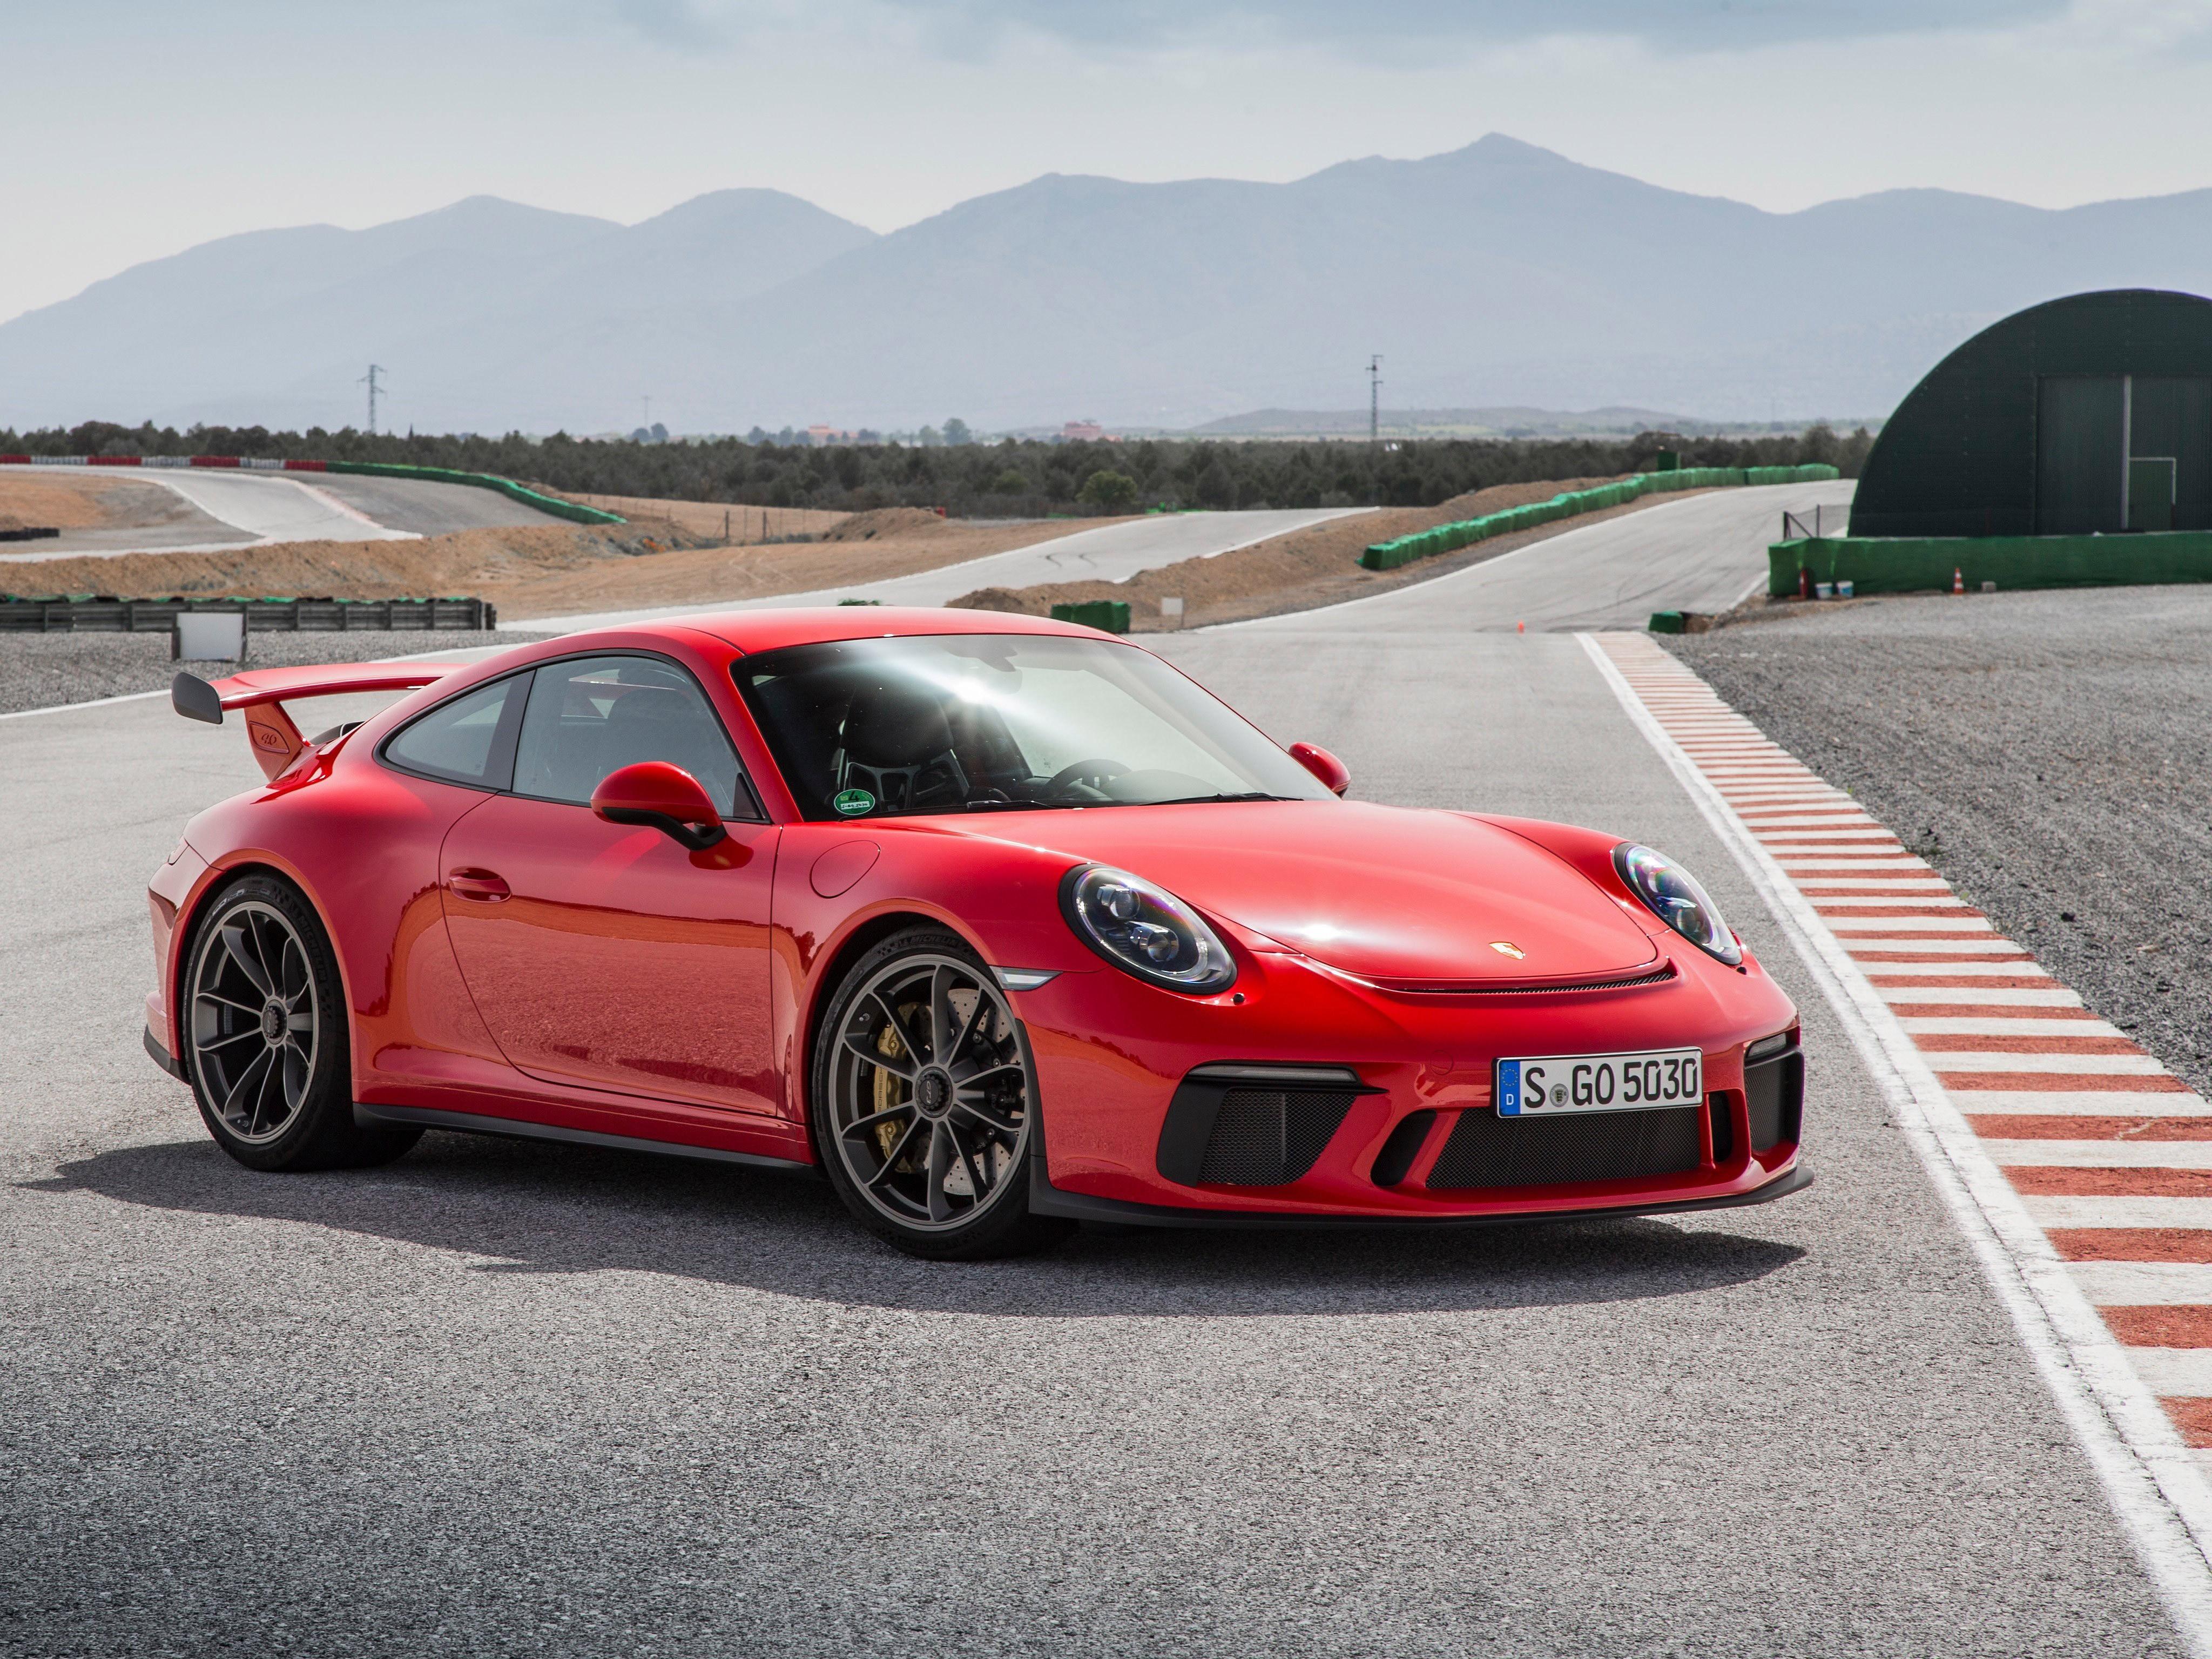 92 Porsche 911 GT3 HD Wallpapers Background Images 4096x3072